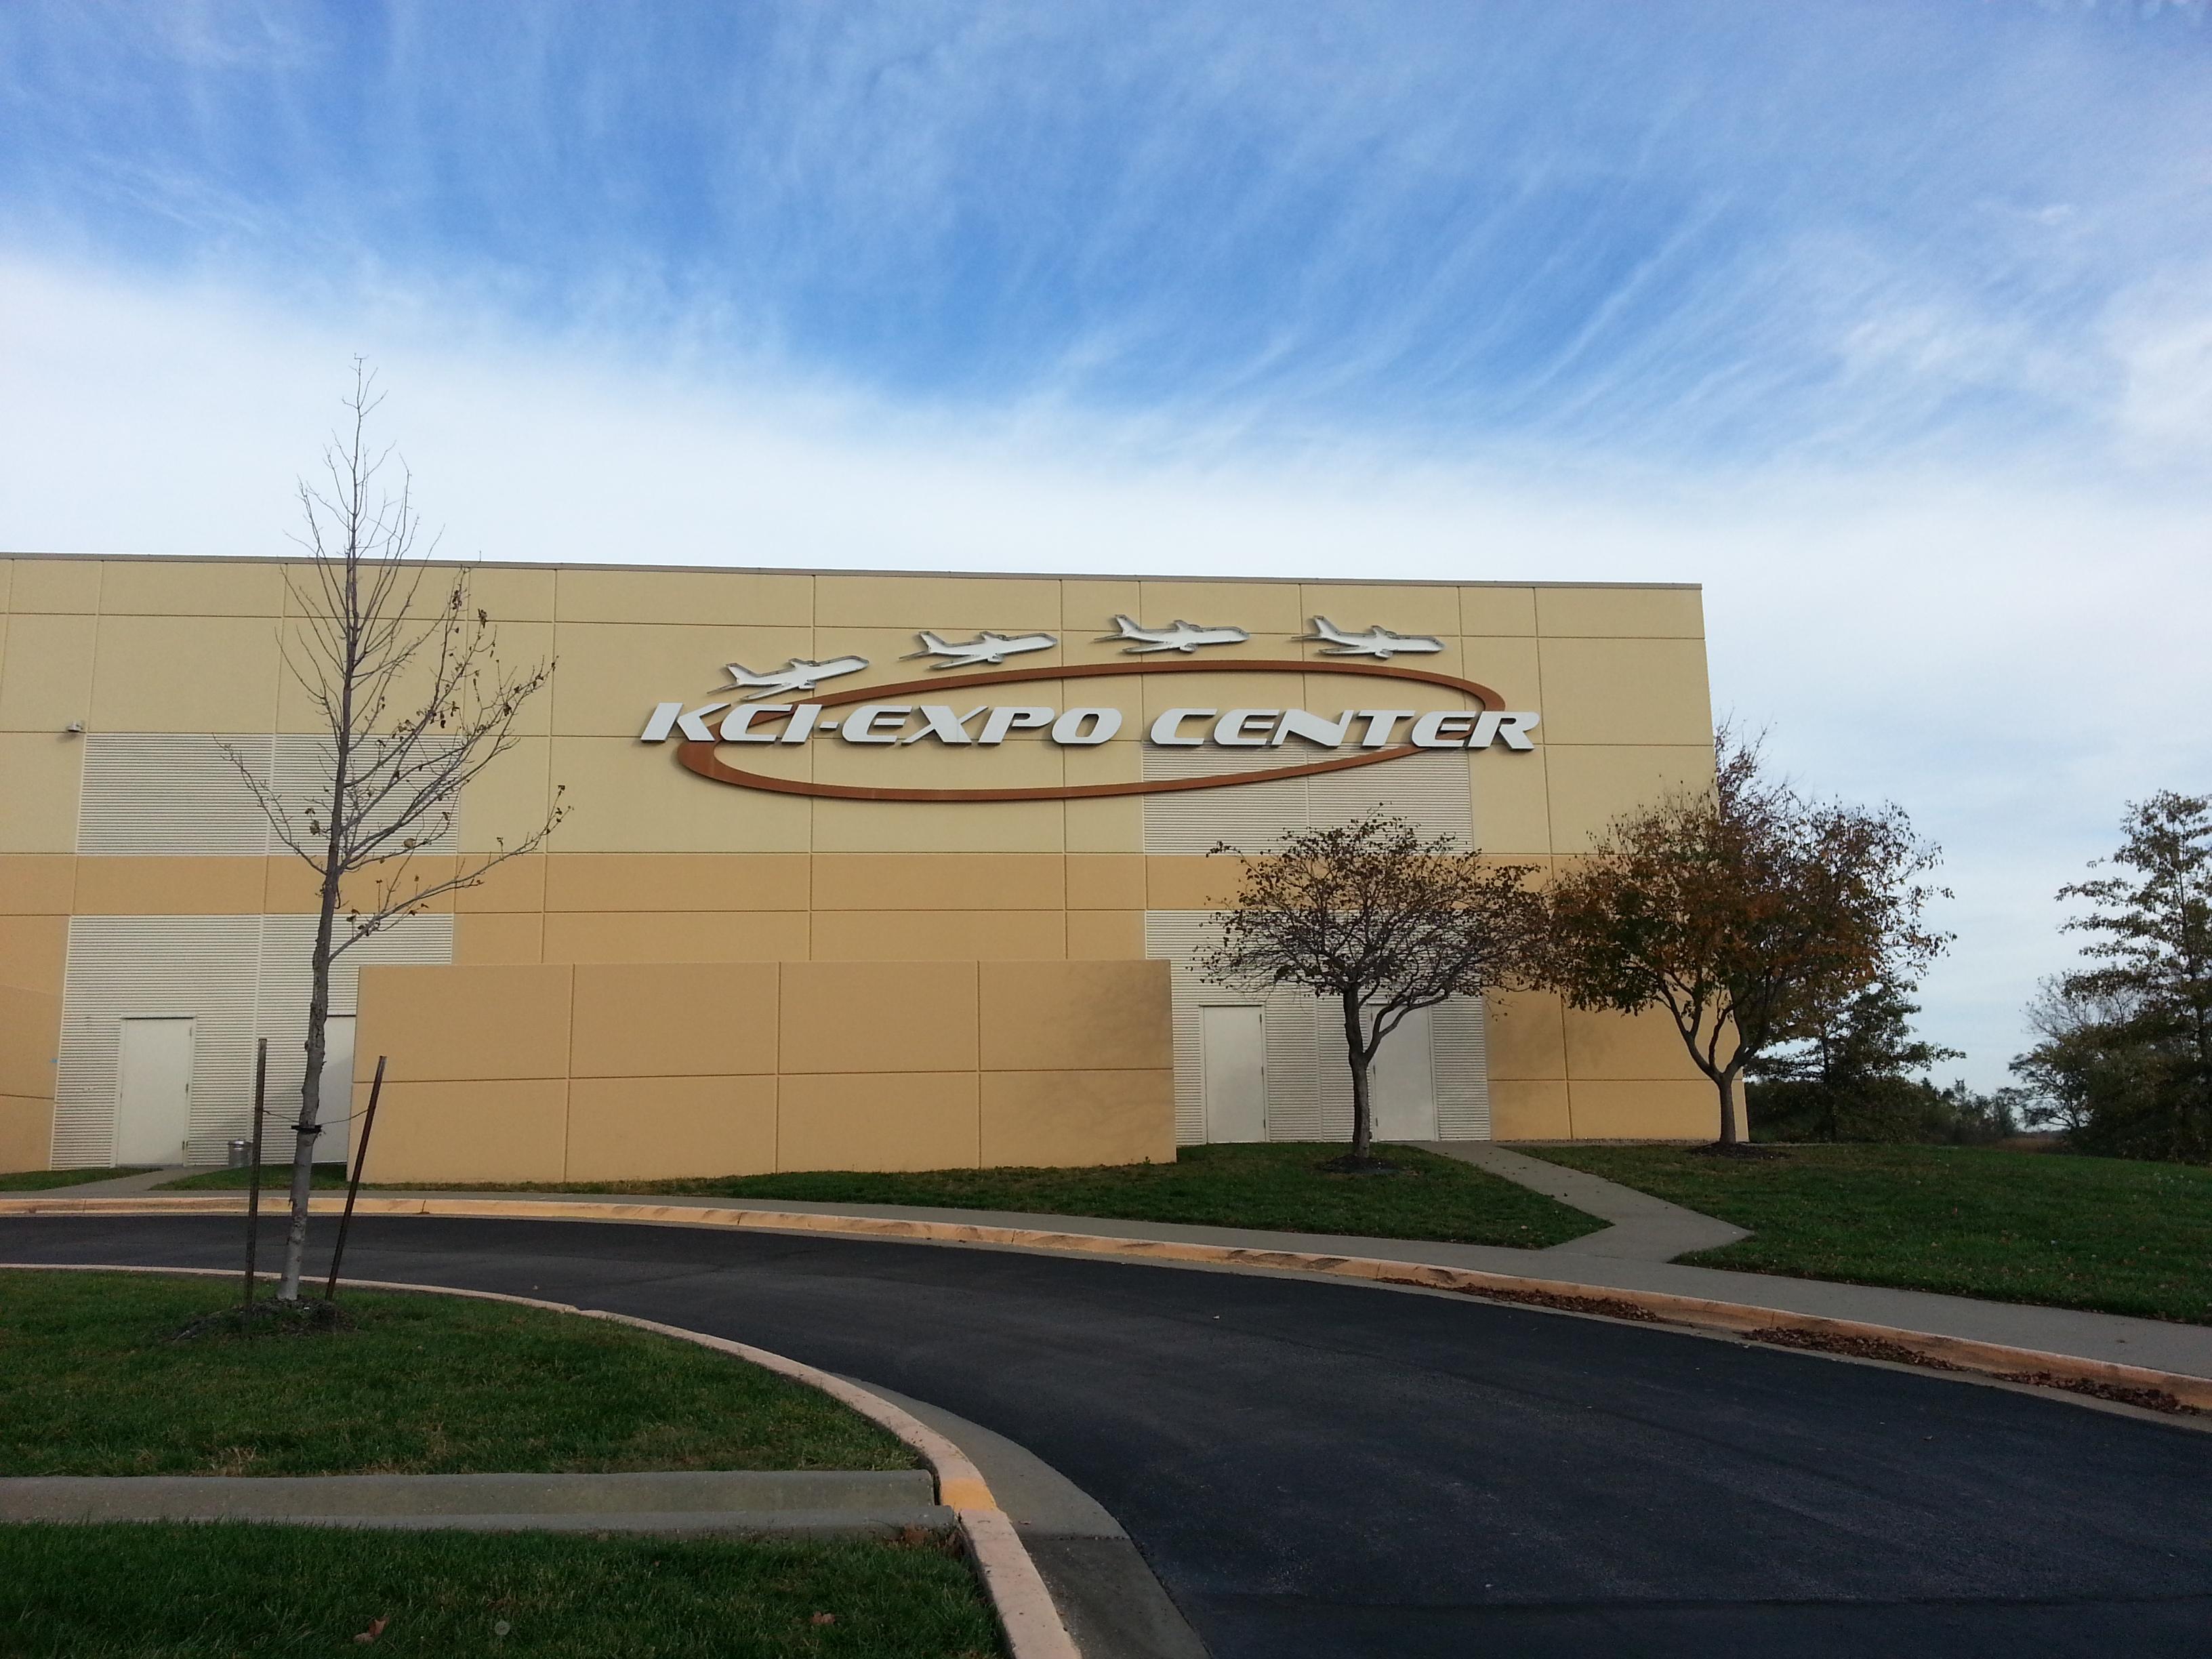 KCI Expo Center outside building